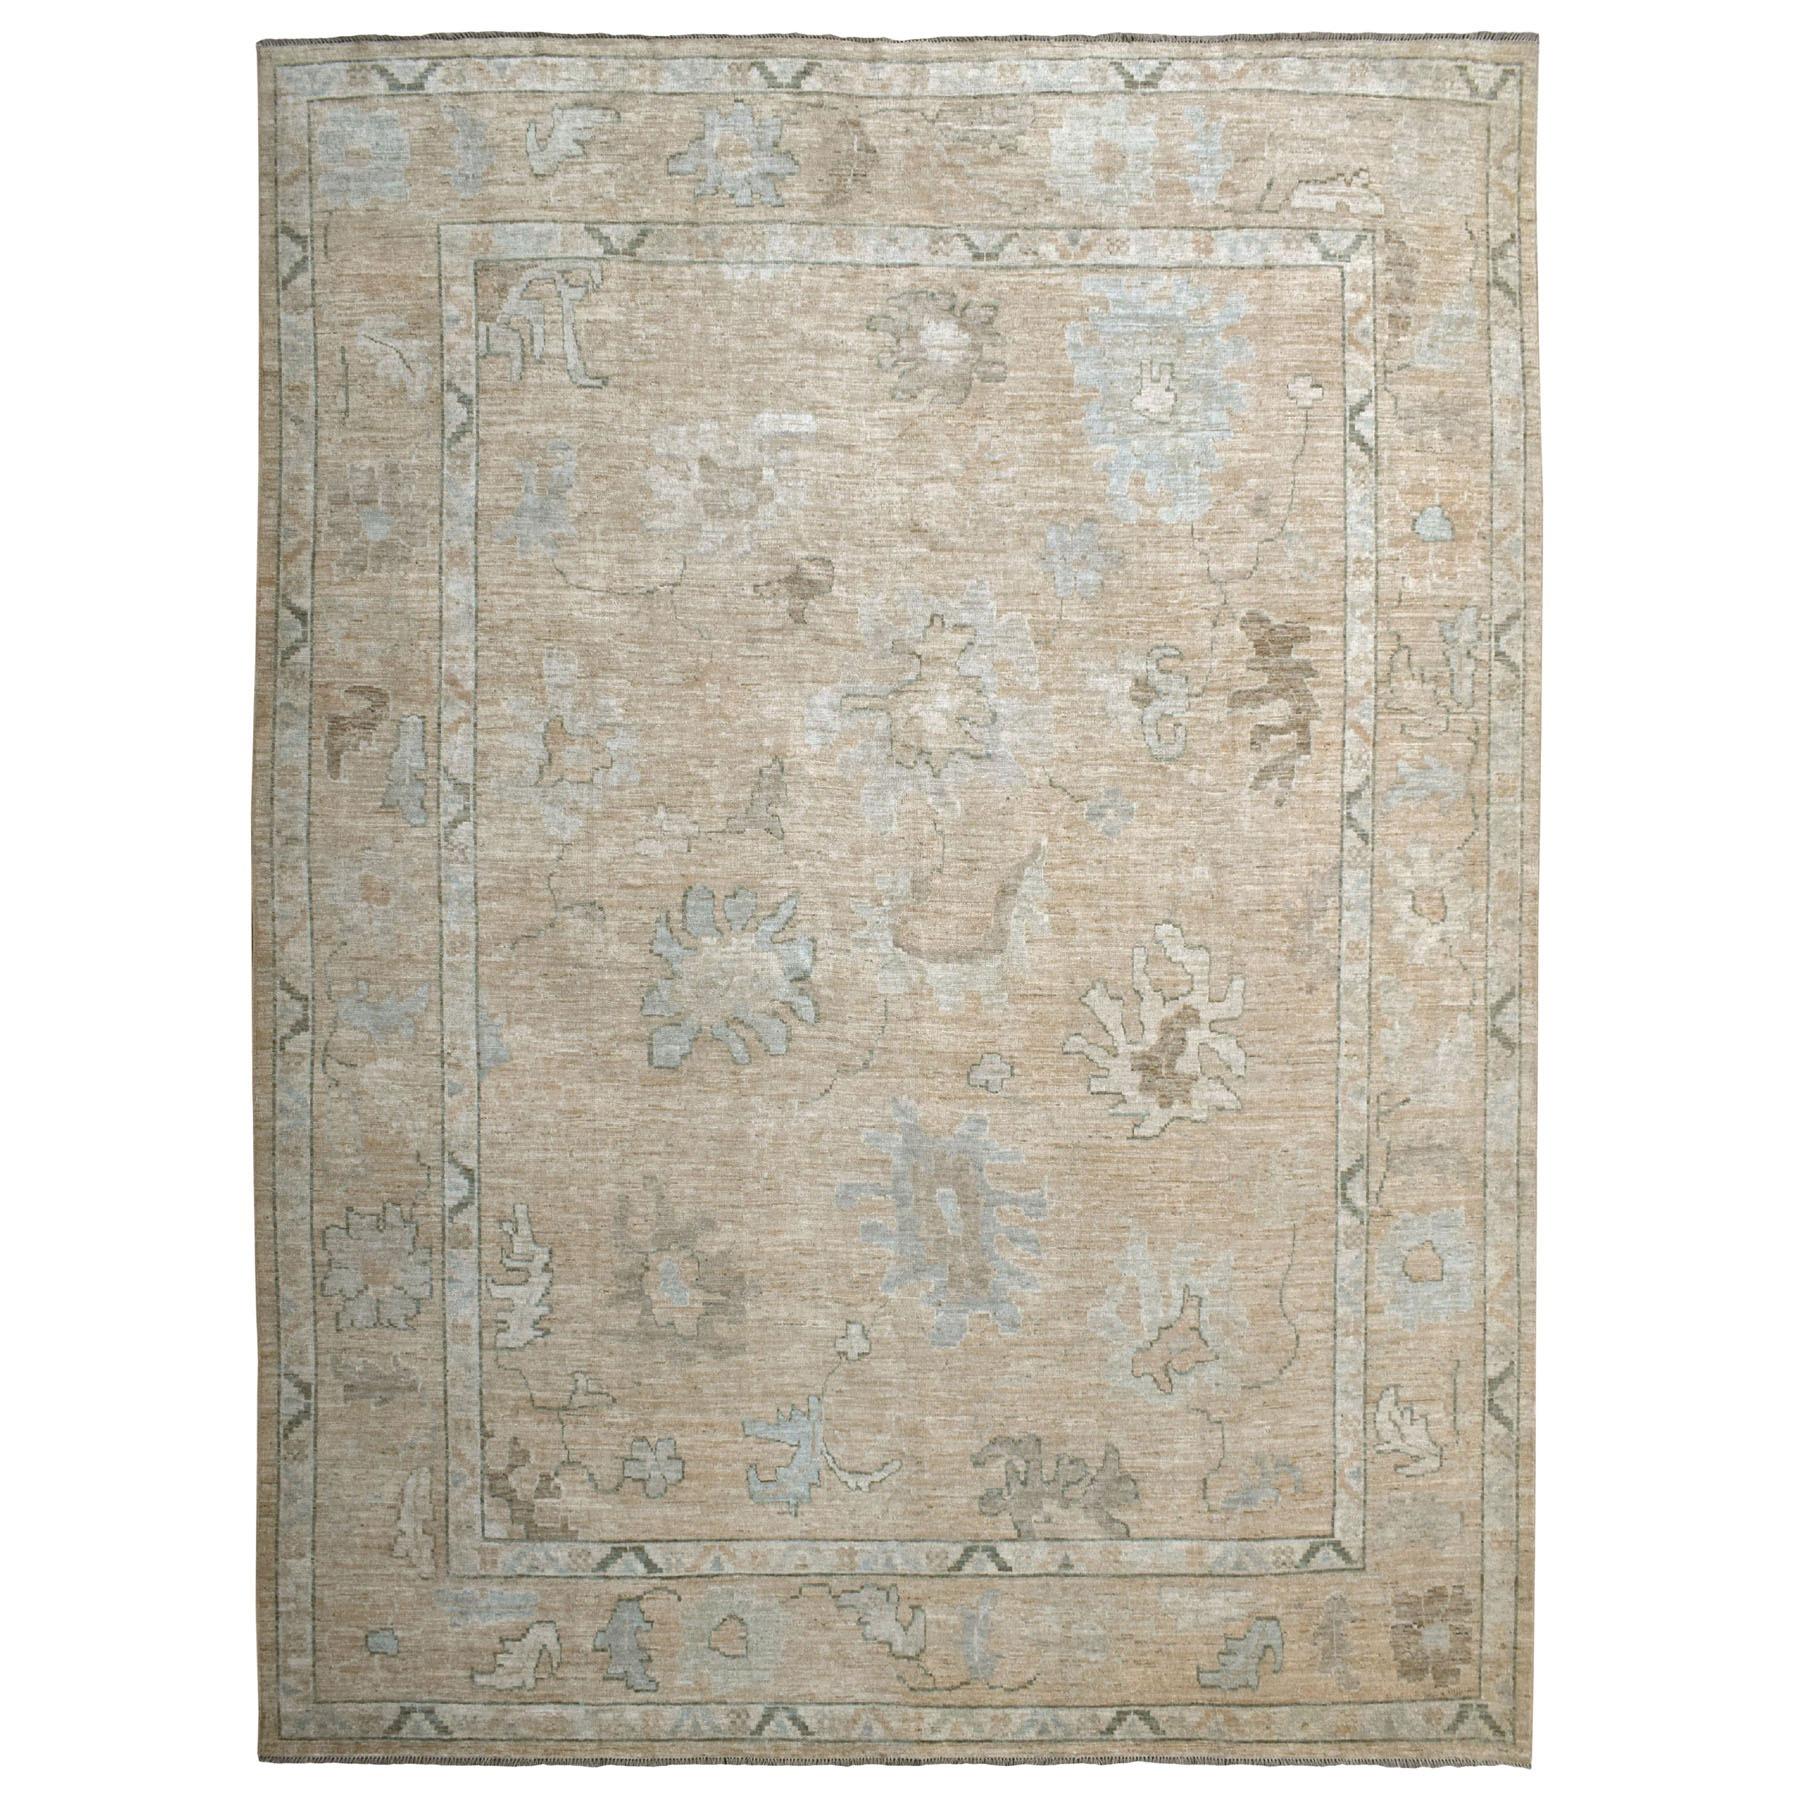 "11'10""X14'3"" Oversized Angora Oushak Soft Velvety Wool Hand Knotted Oriental Rug moaec6e8"